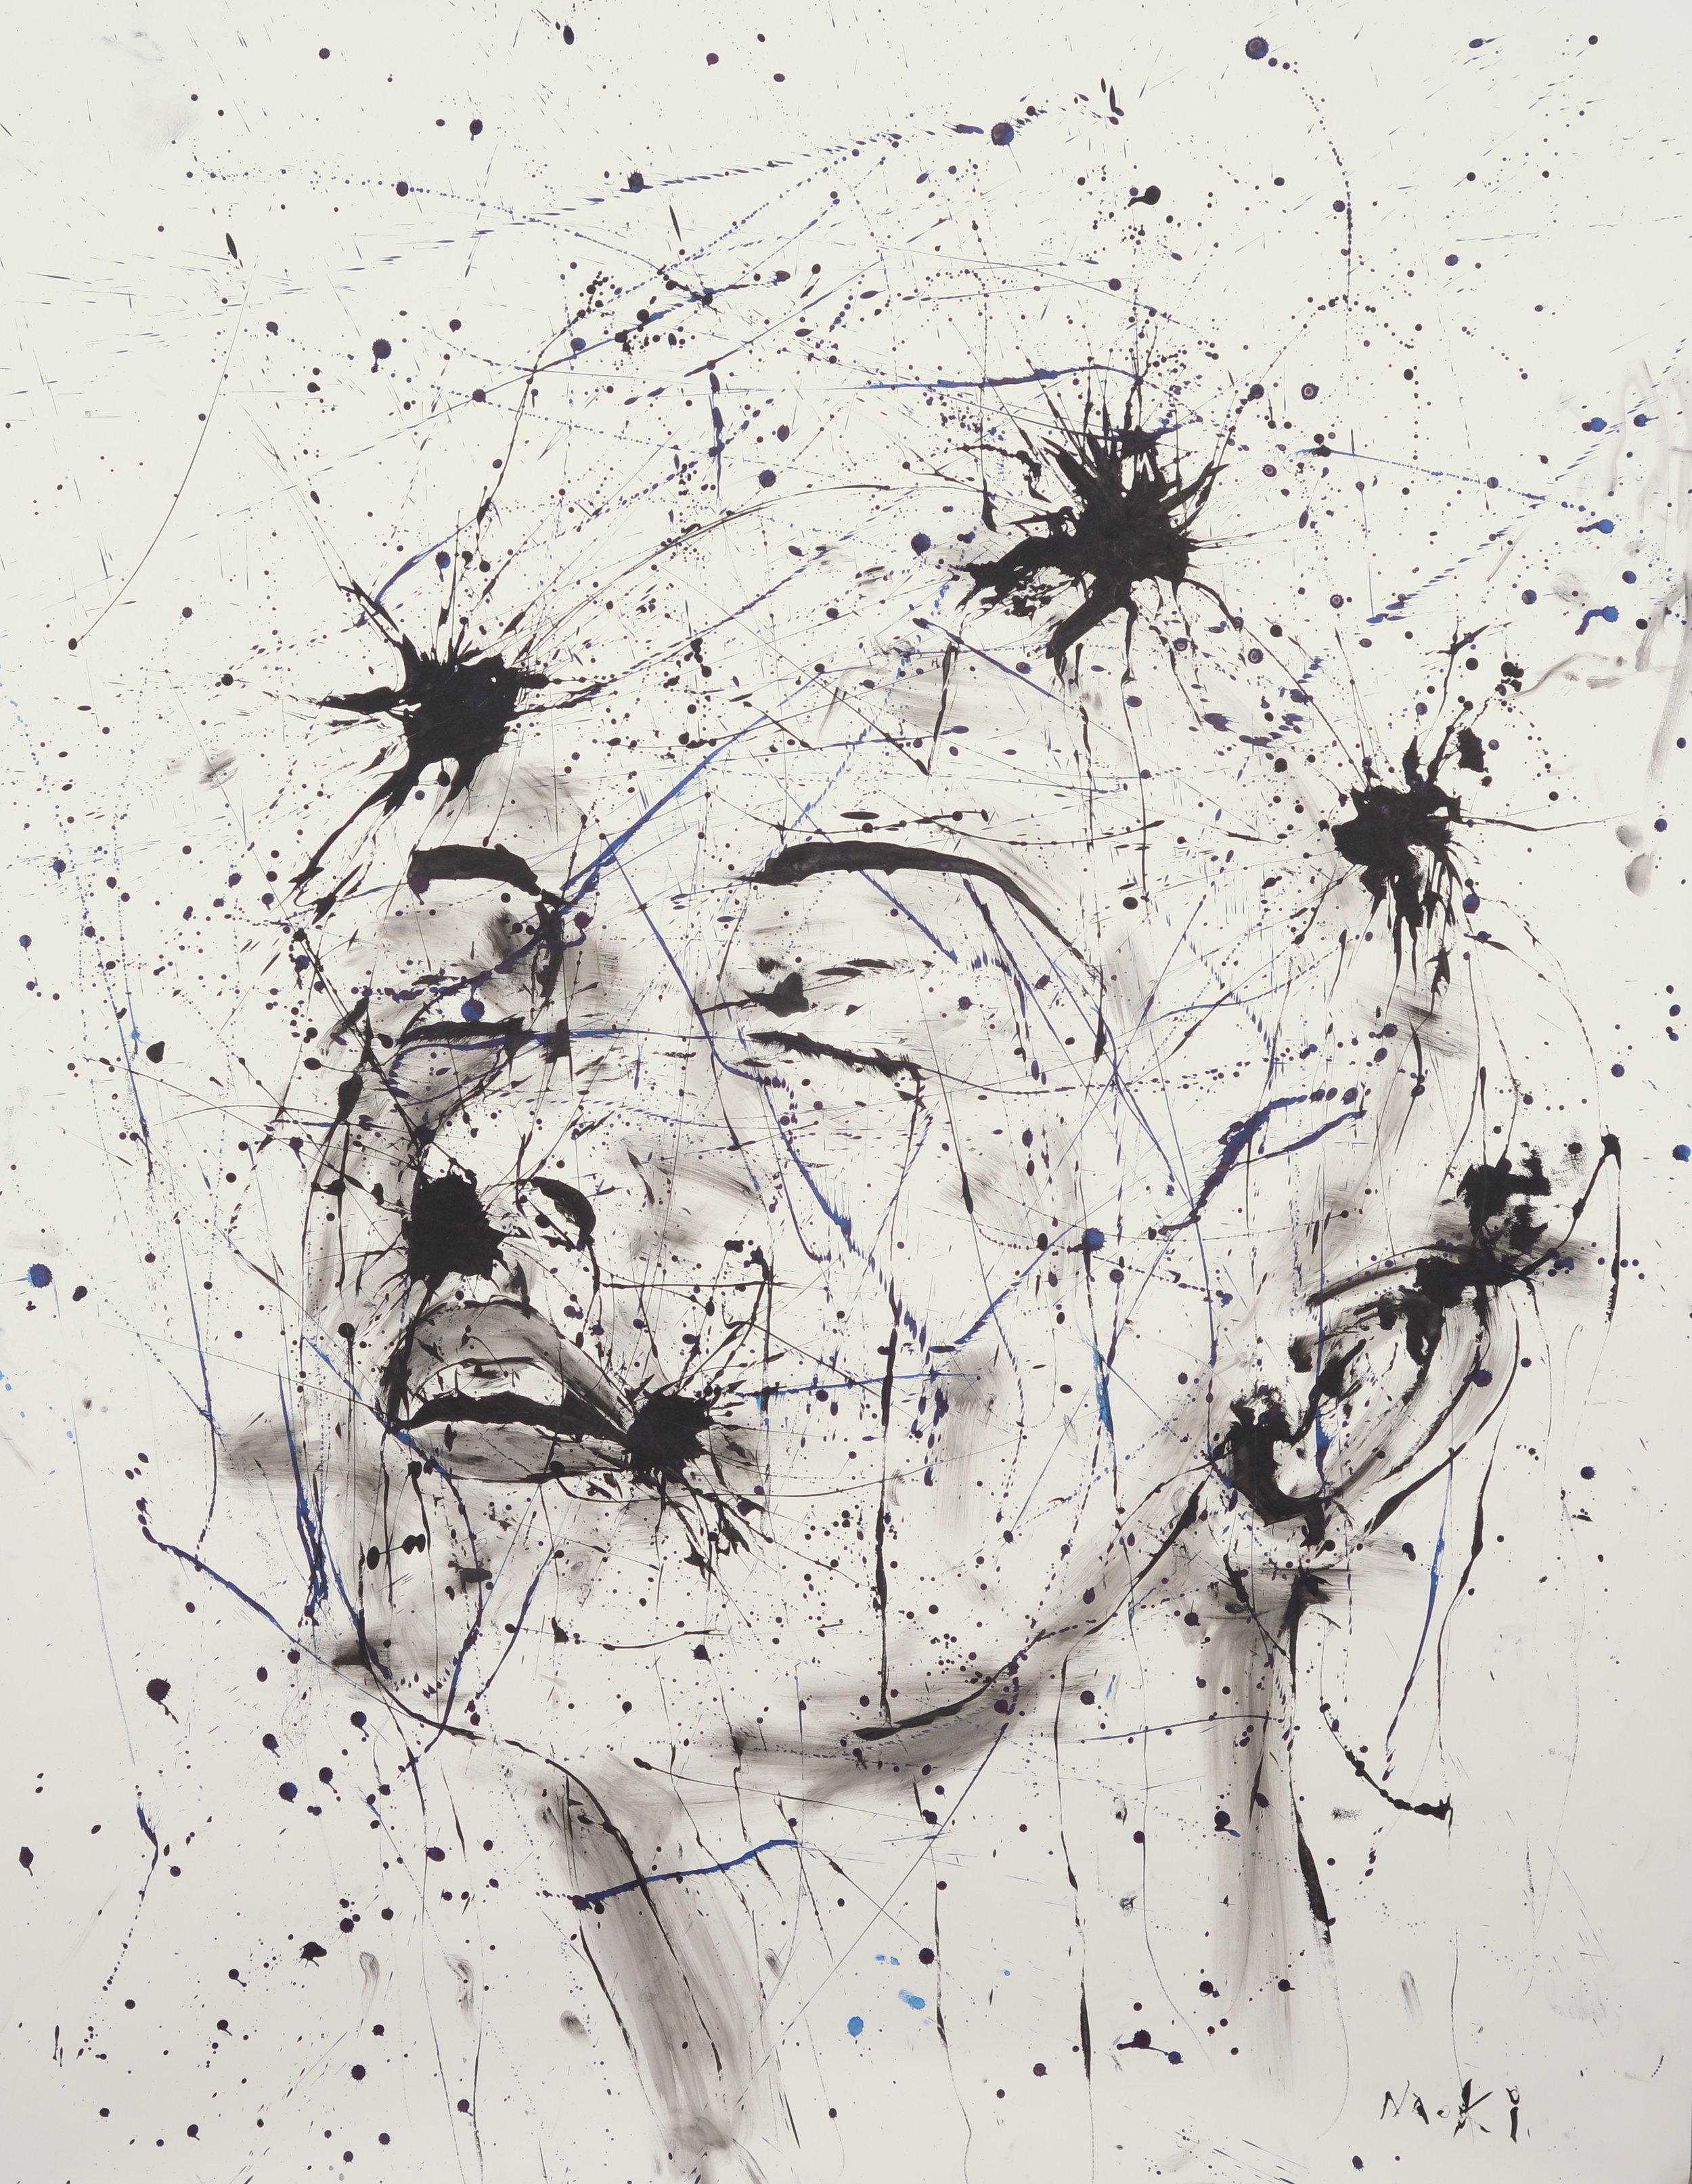 Naoki Fuku, Study of the Human Mind - Calm. ink on Paper, 100 x 210cm 2016